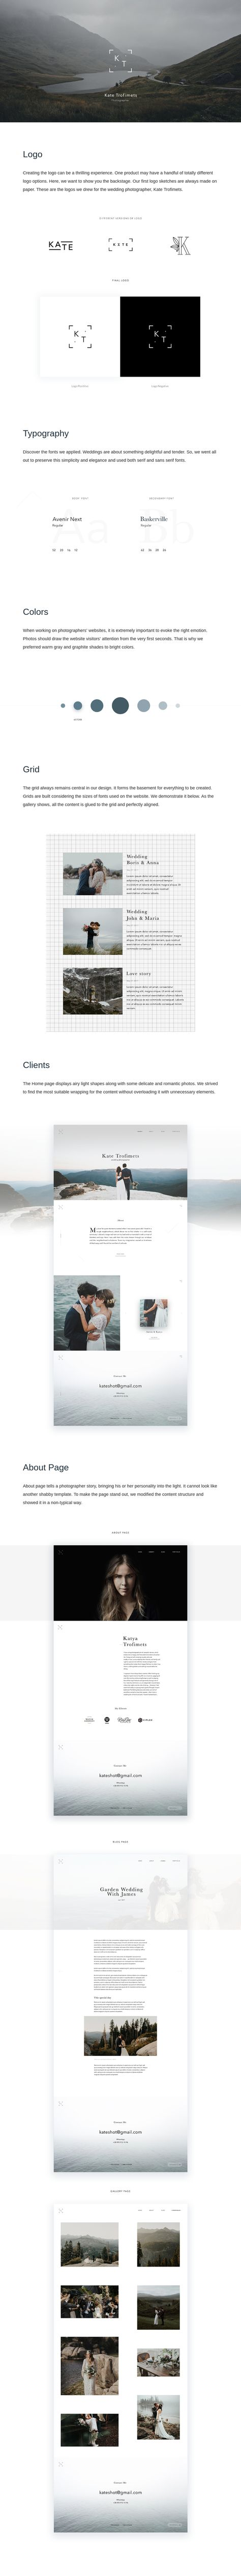 Wedding-Photographer-web-design-inspiration-ui-ux-glyph-studio-agency-gallery-portfolio-logo